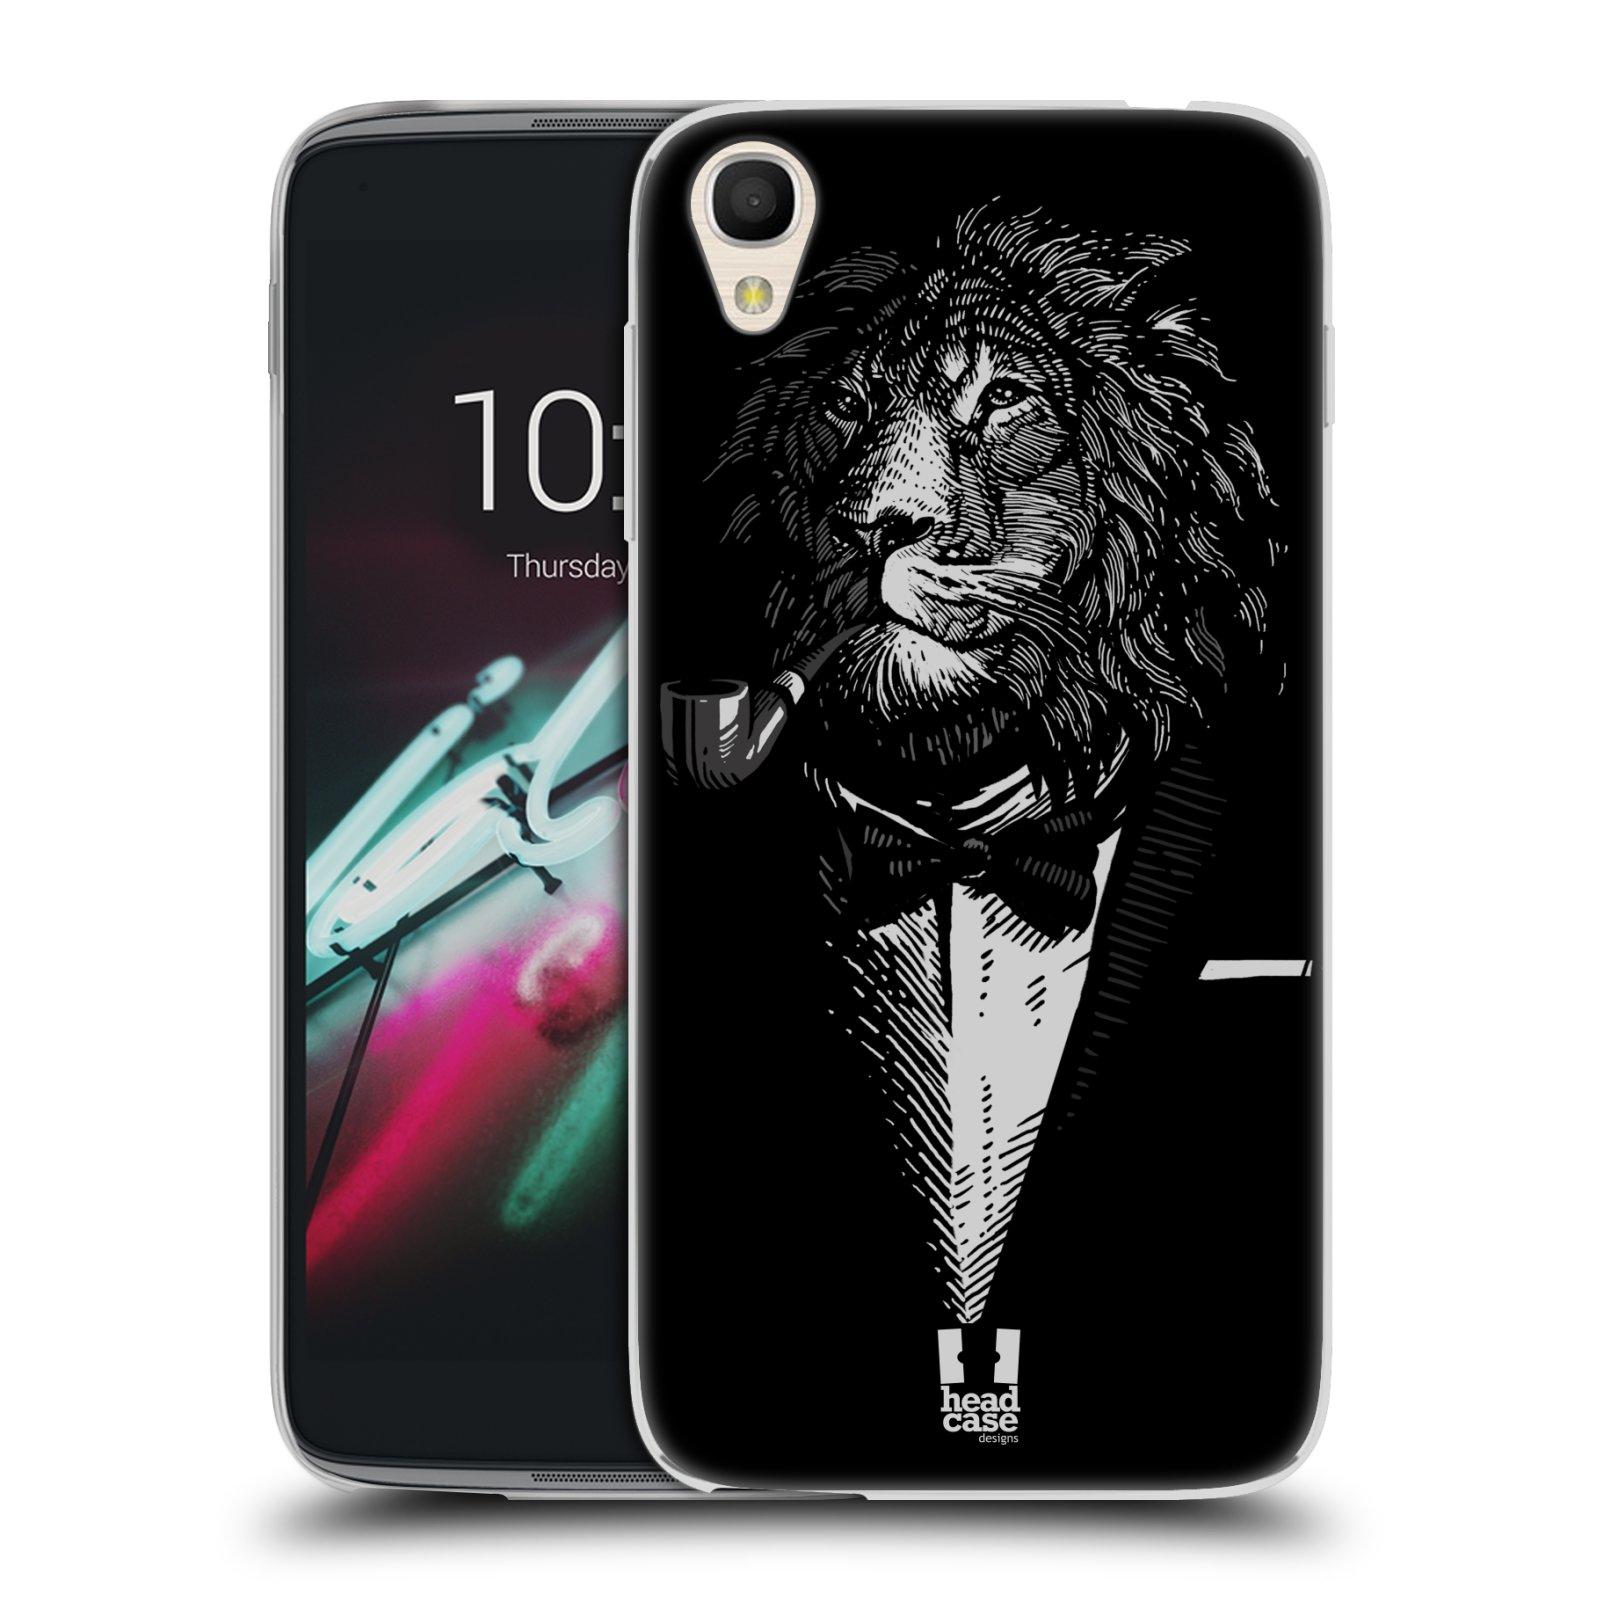 "Silikonové pouzdro na mobil Alcatel One Touch 6039Y Idol 3 HEAD CASE LEV V KVÁDRU (Silikonový kryt či obal na mobilní telefon Alcatel One Touch Idol 3 OT-6039Y s 4,7"" displejem)"